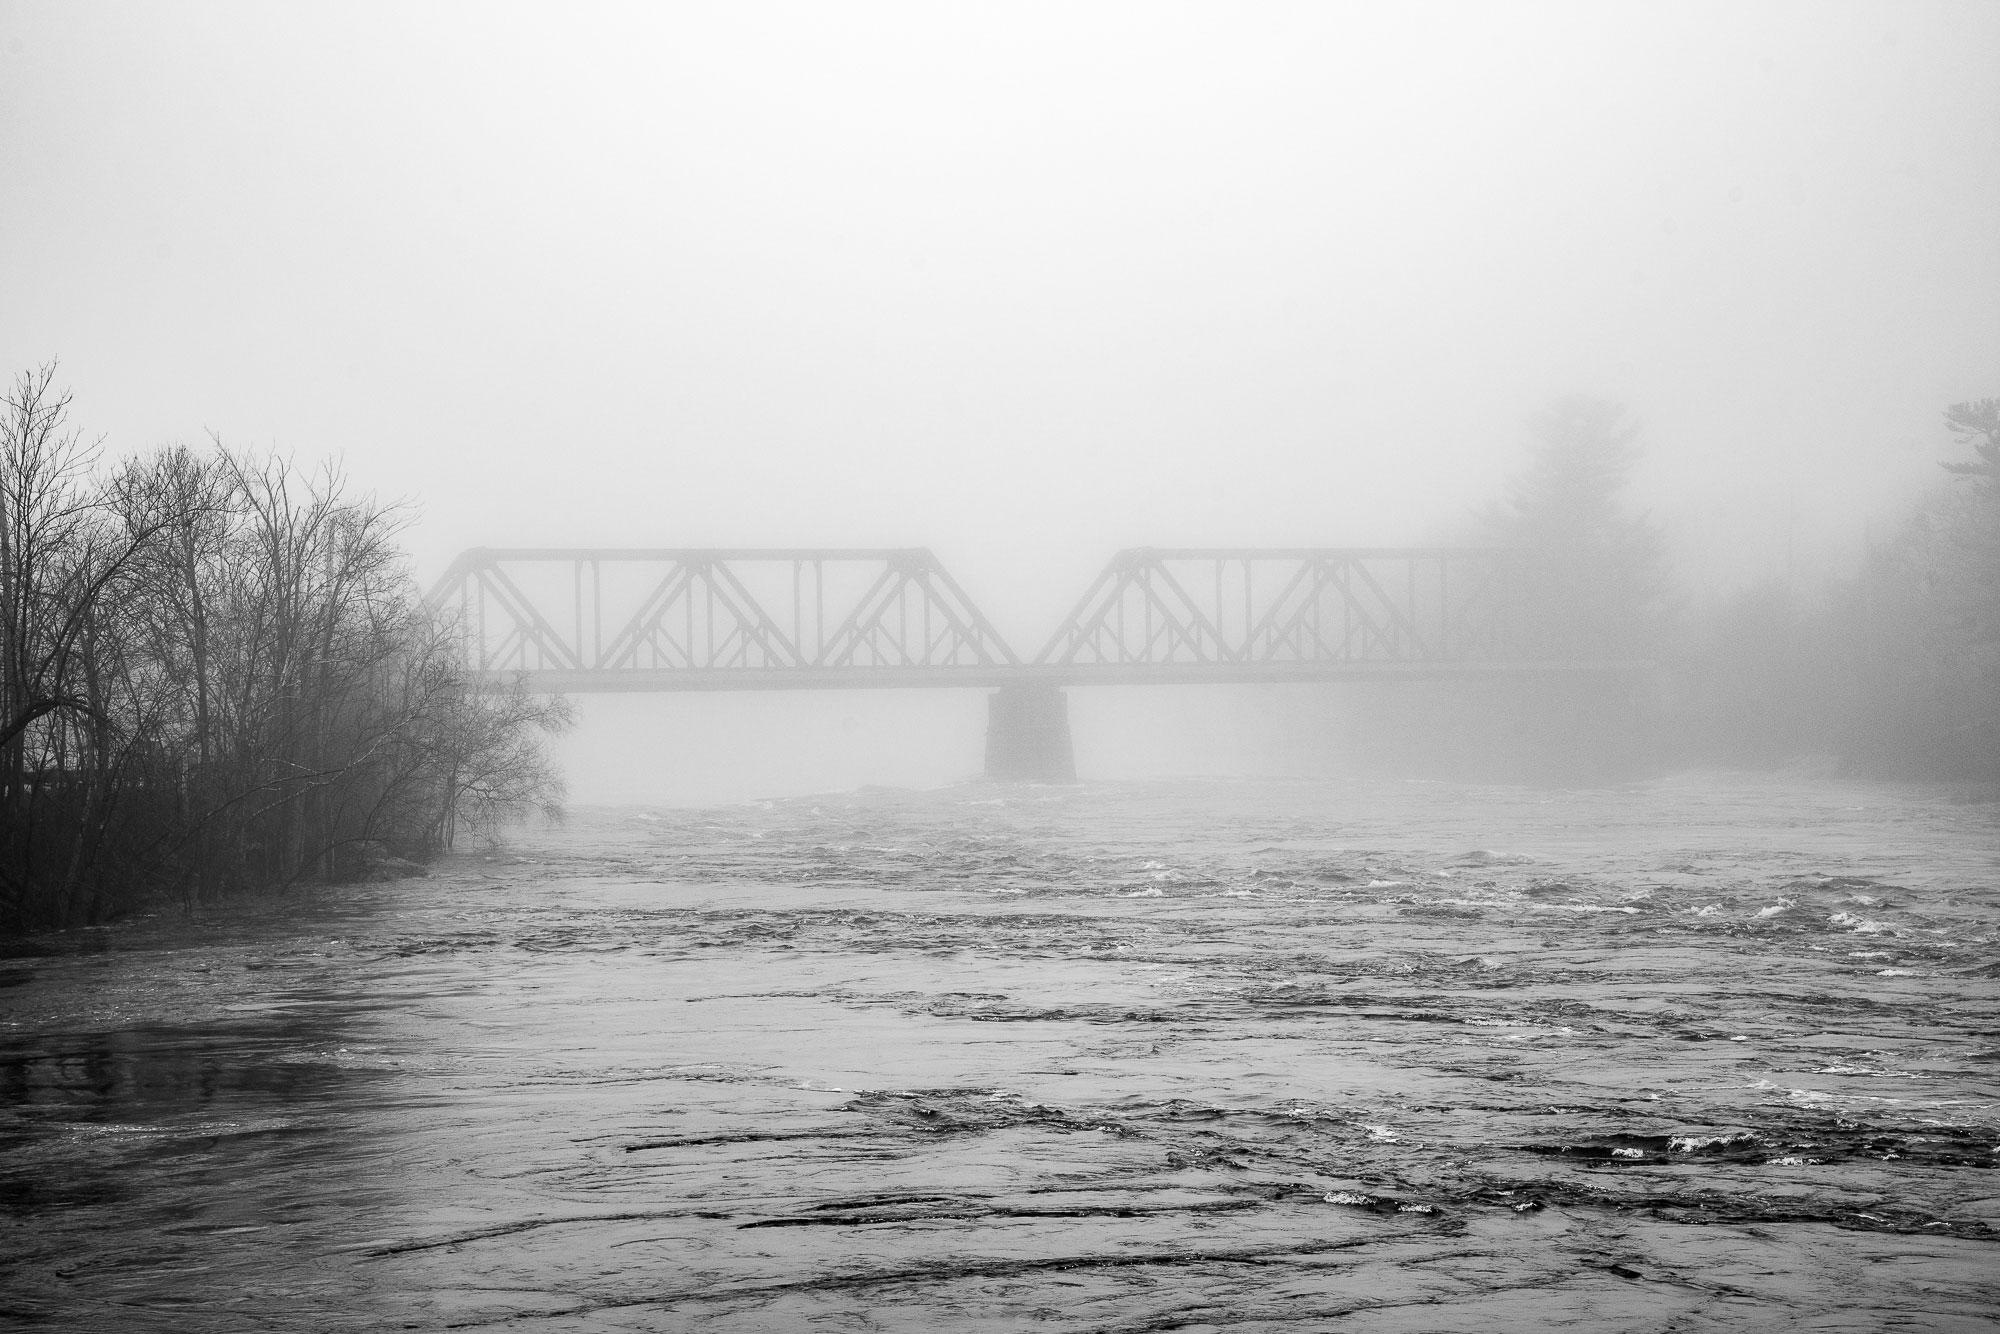 The Black Bridge, Brunswick Topsham